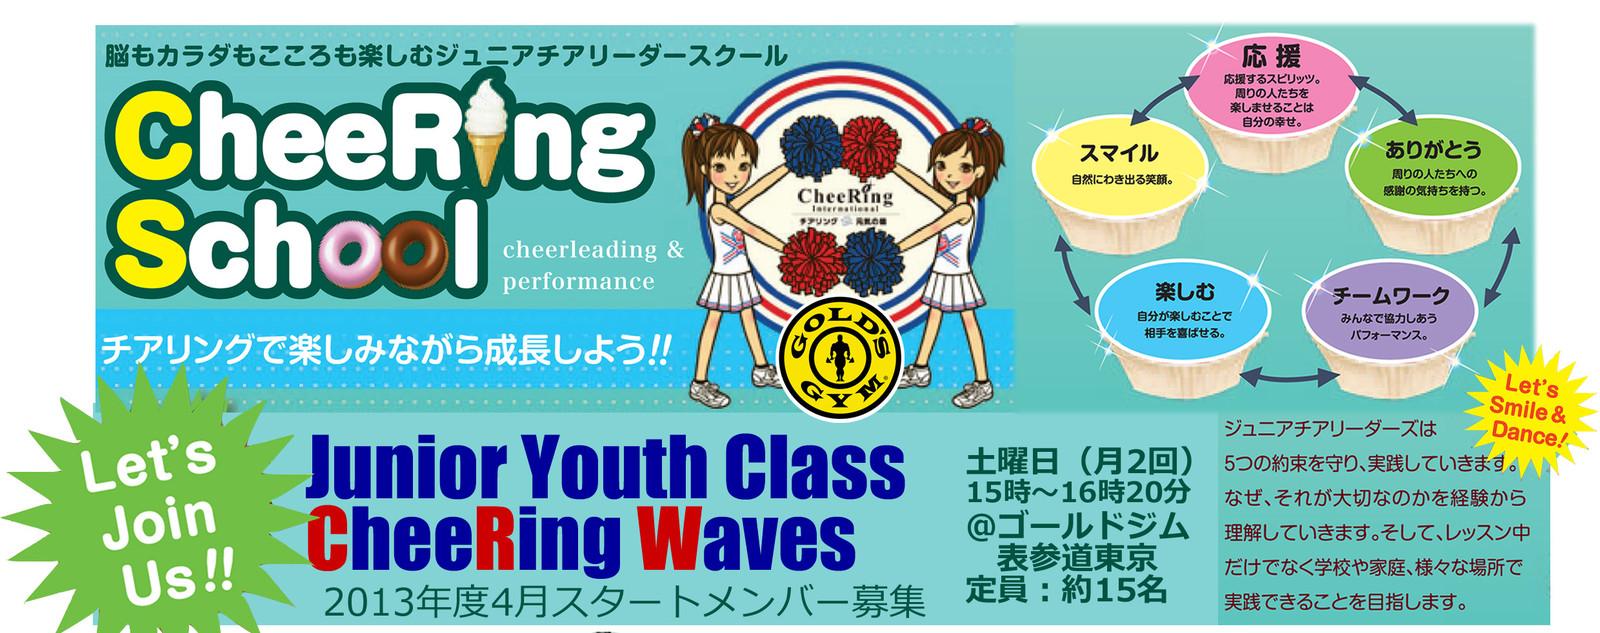 Cheeringjunioryouth2013_web1